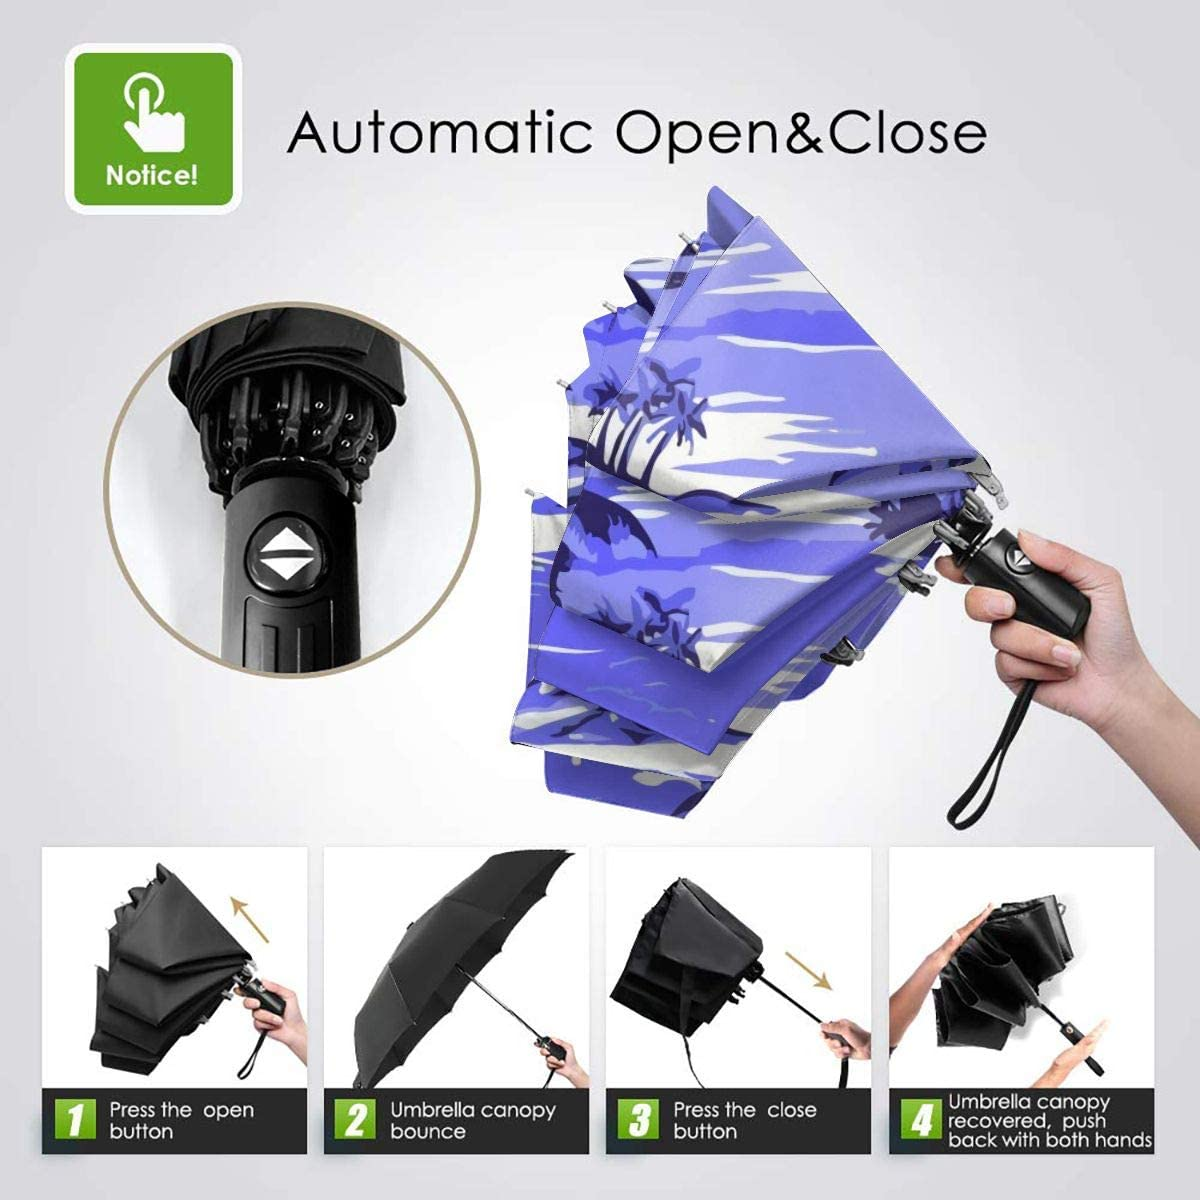 Napili Bay Scenic Hawaiian Automatic Tri-fold Umbrella Stylish Windproof Anti UV Rain//Sun Travel Umbrella Light Weight.